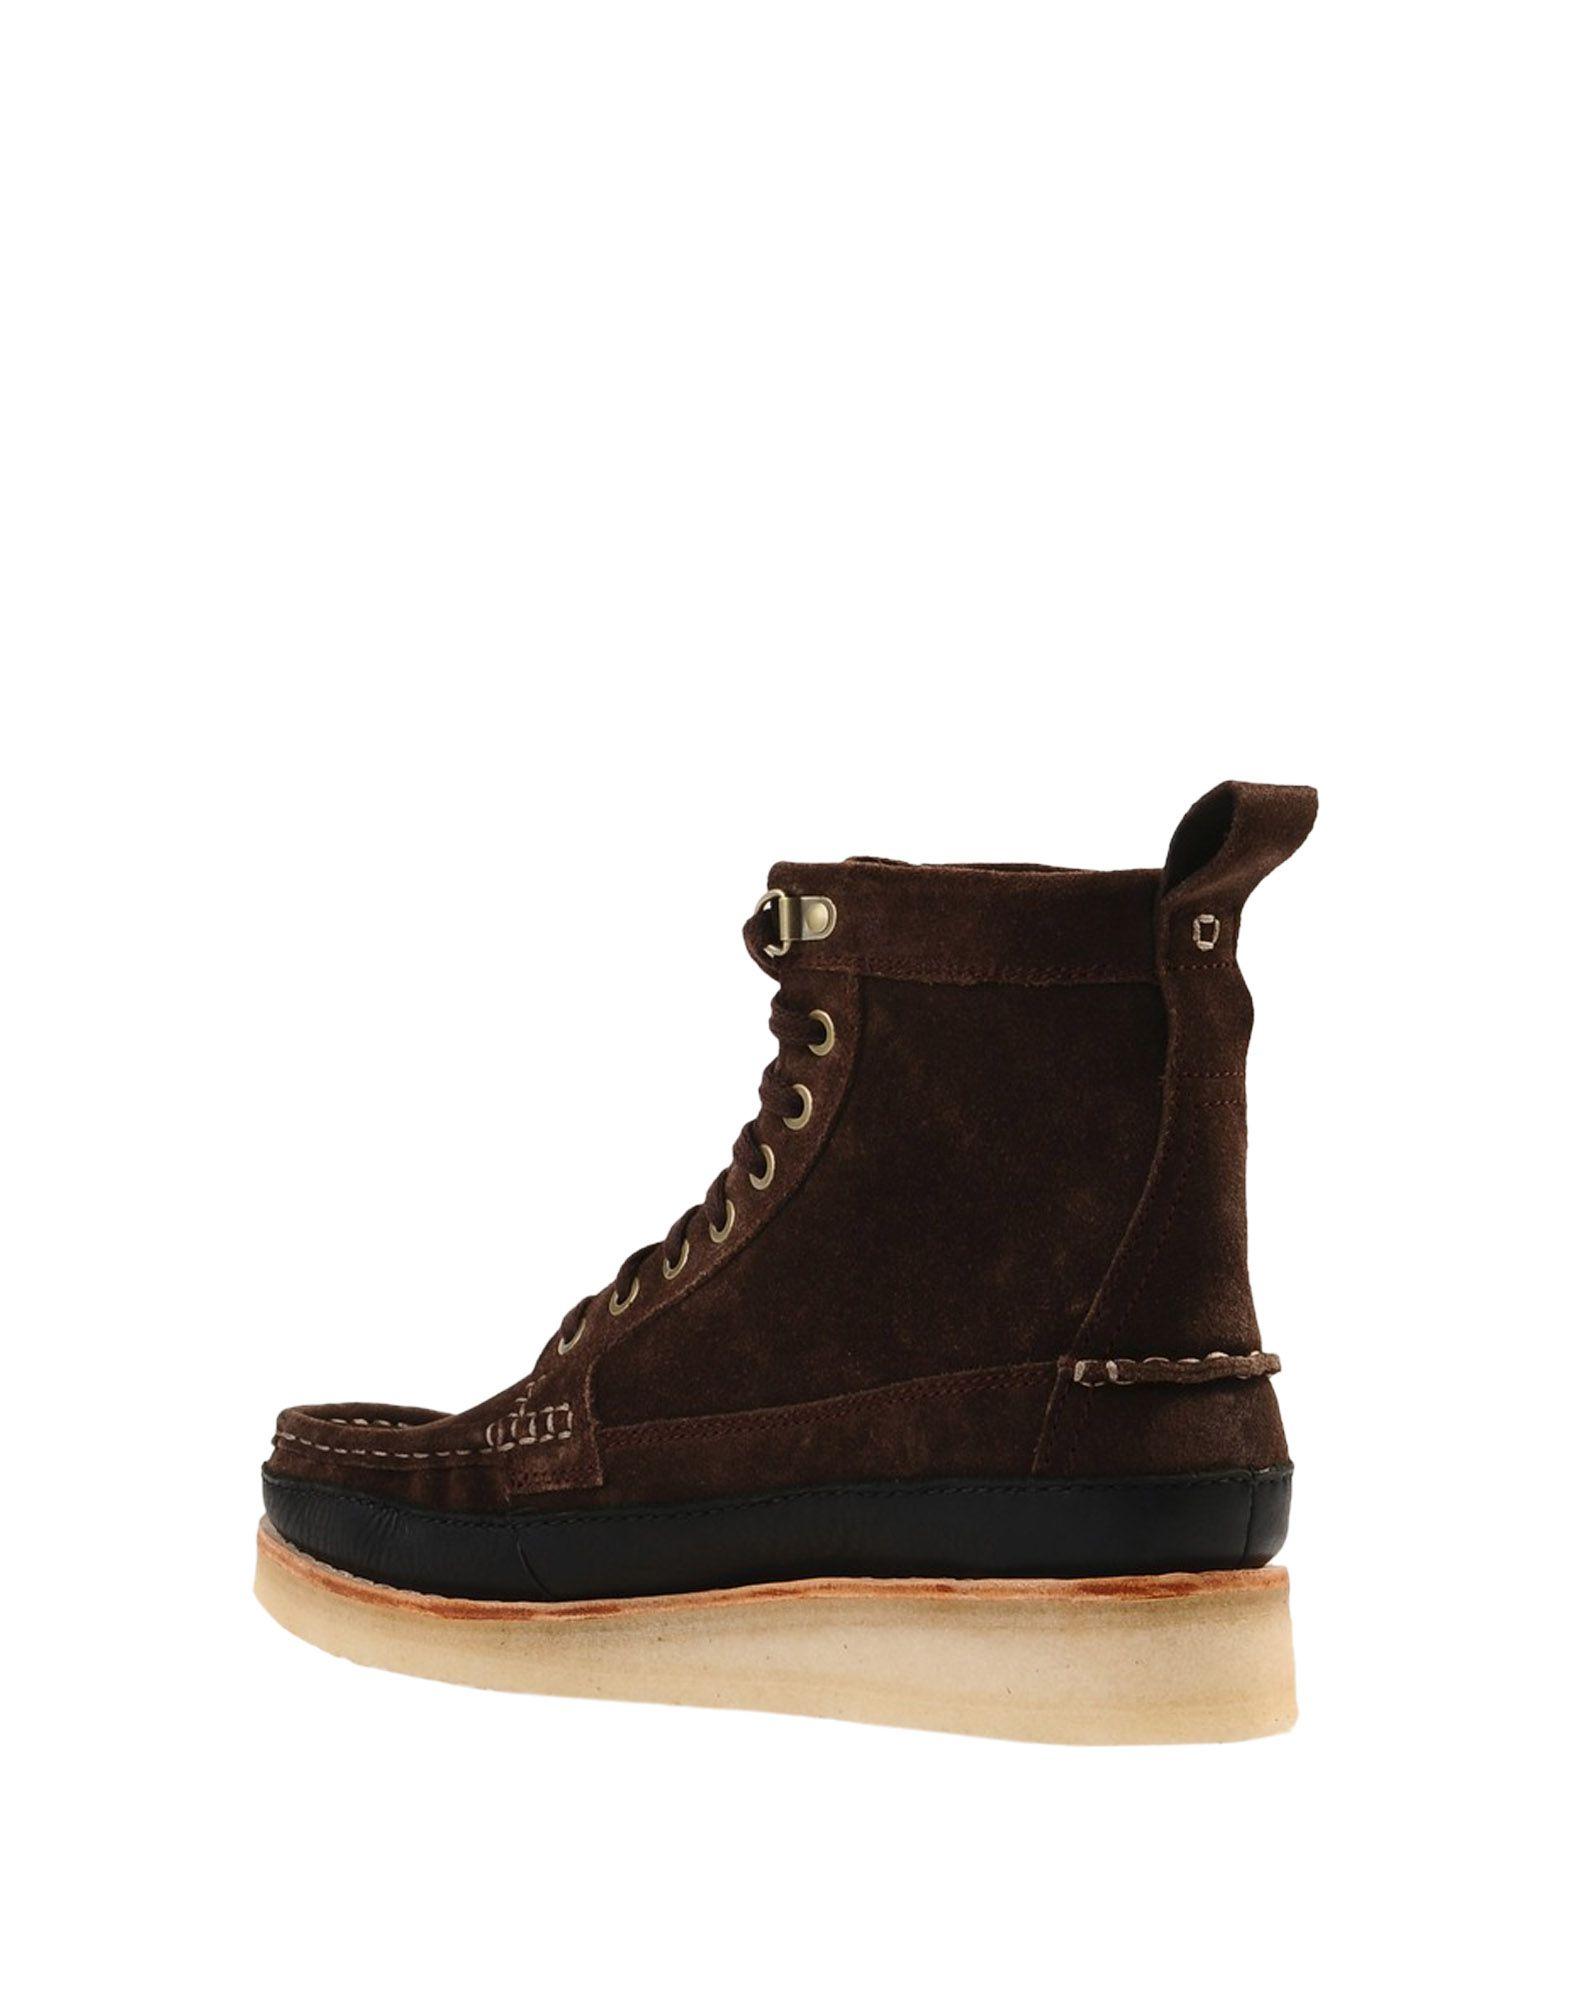 Clarks Originals Originals Boots - Men Clarks Originals Originals Boots online on  Australia - 11577612QW c1e827